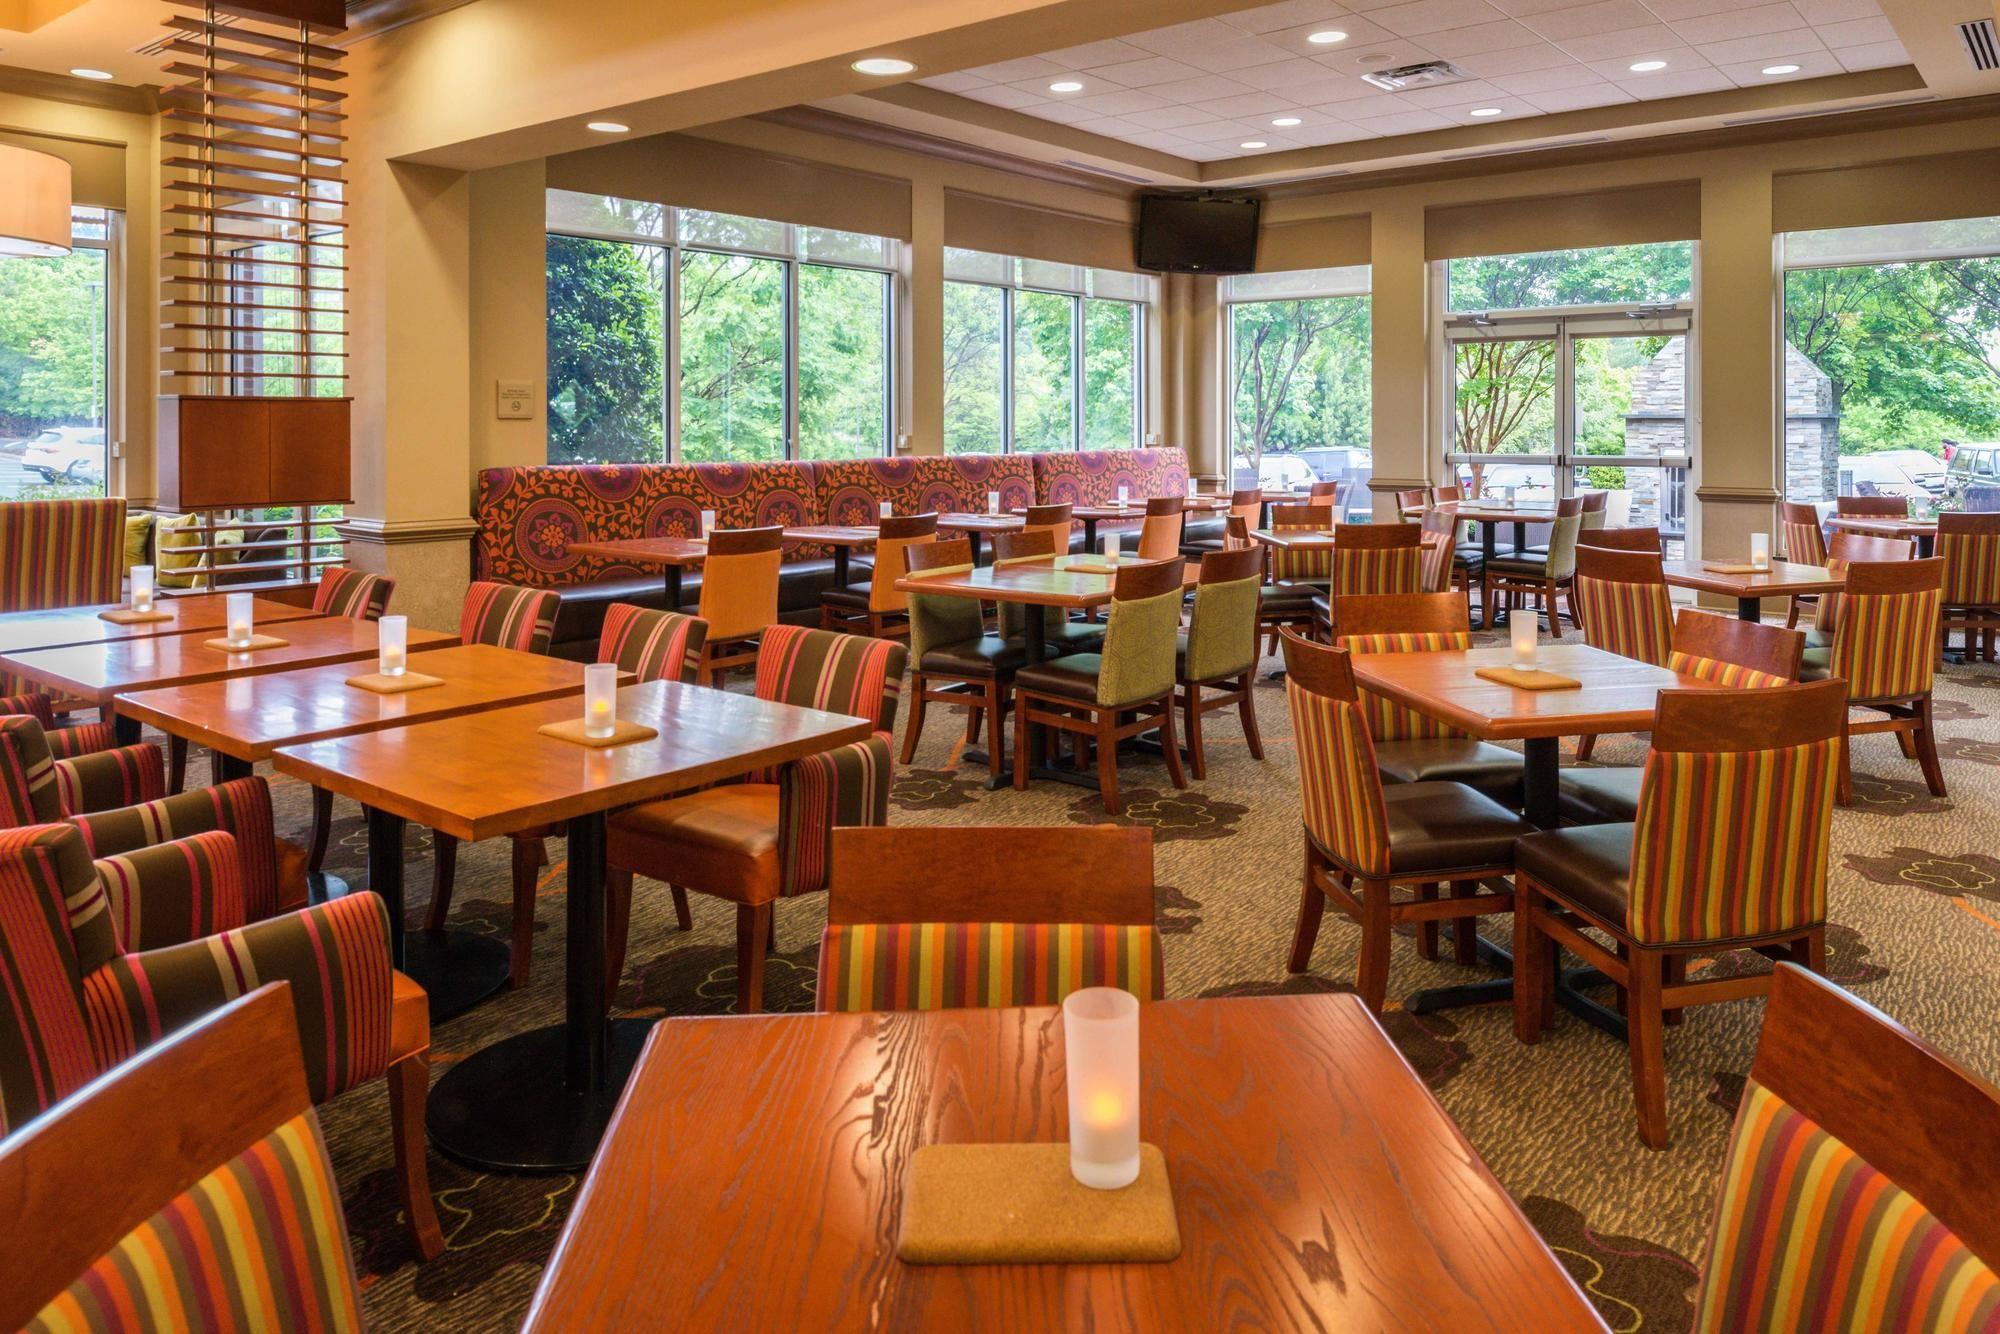 Discount Coupon for Hilton Garden Inn Charlottesville in ...